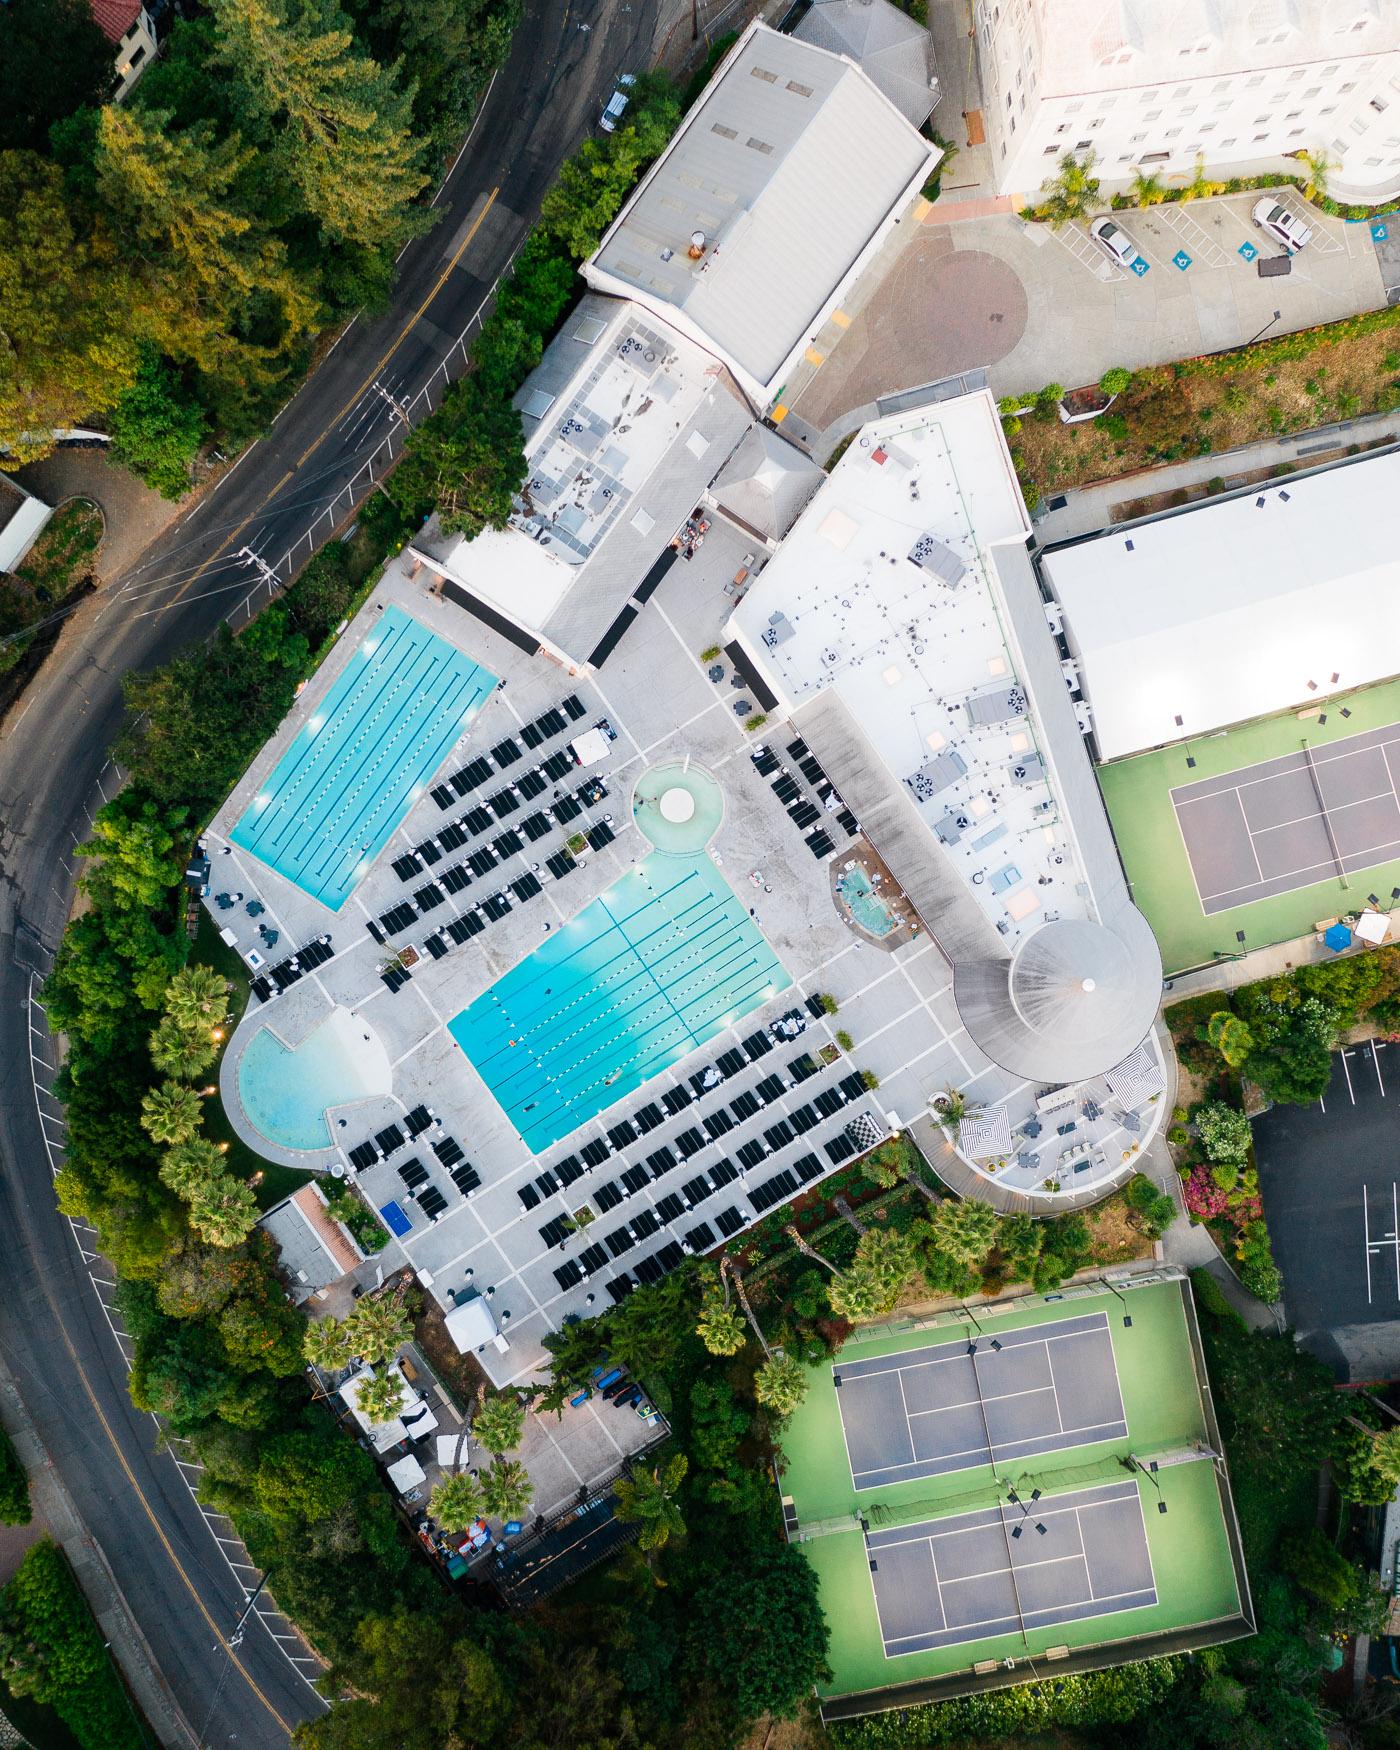 claremont-hotel-berkeley-12.jpg